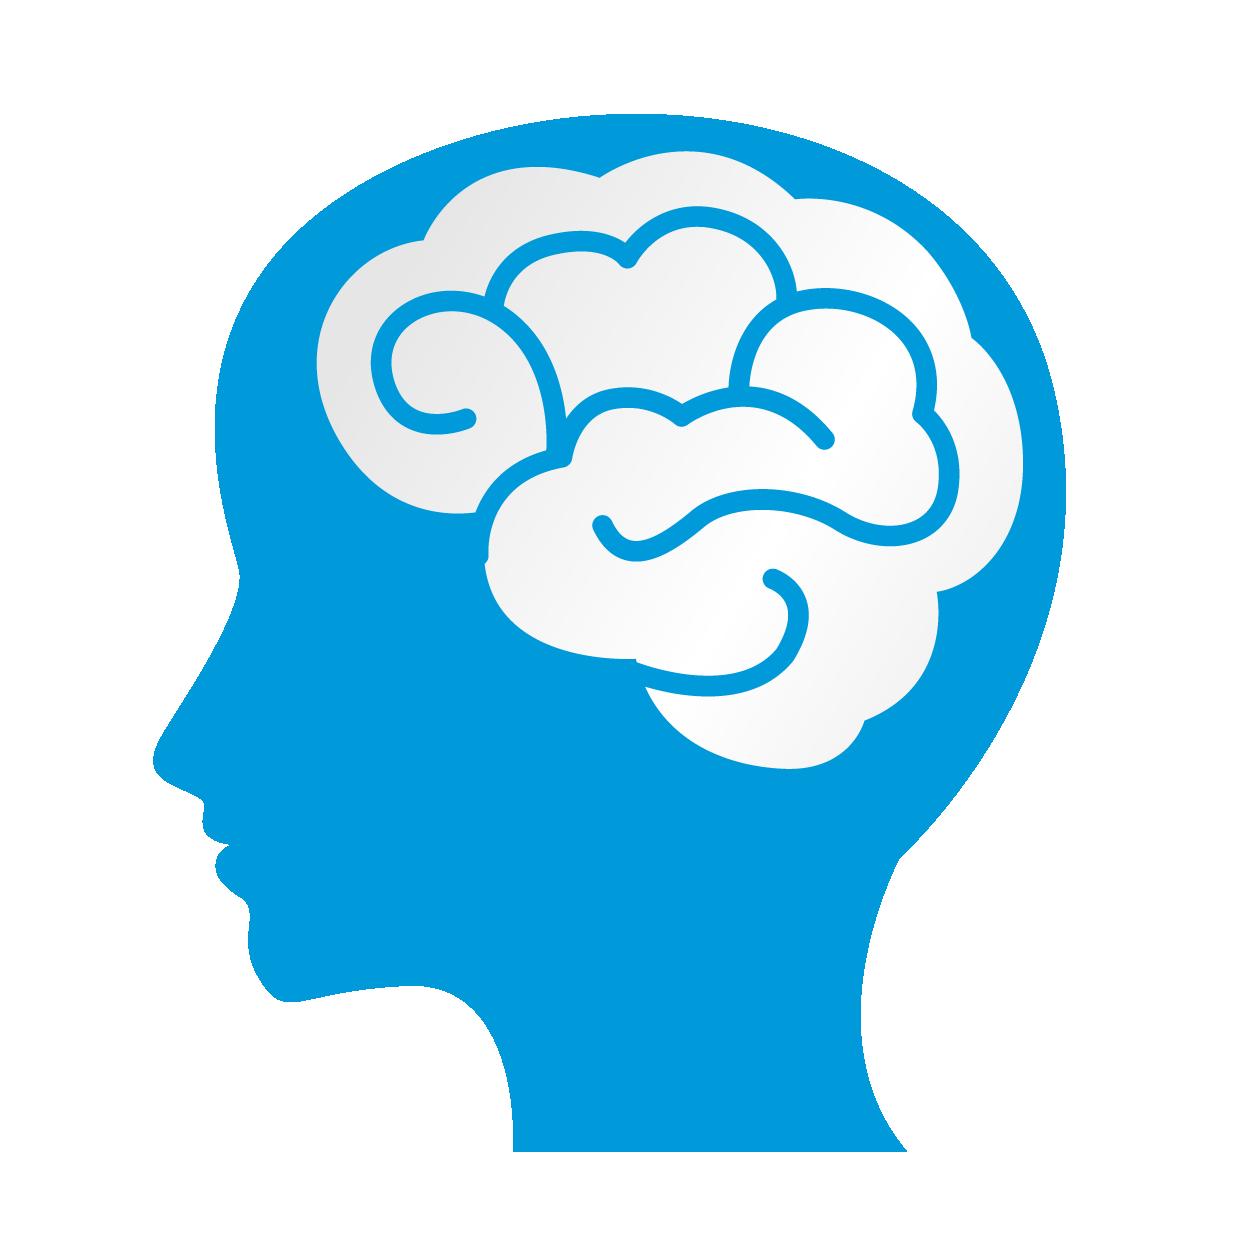 Page design web . Mind clipart mental health